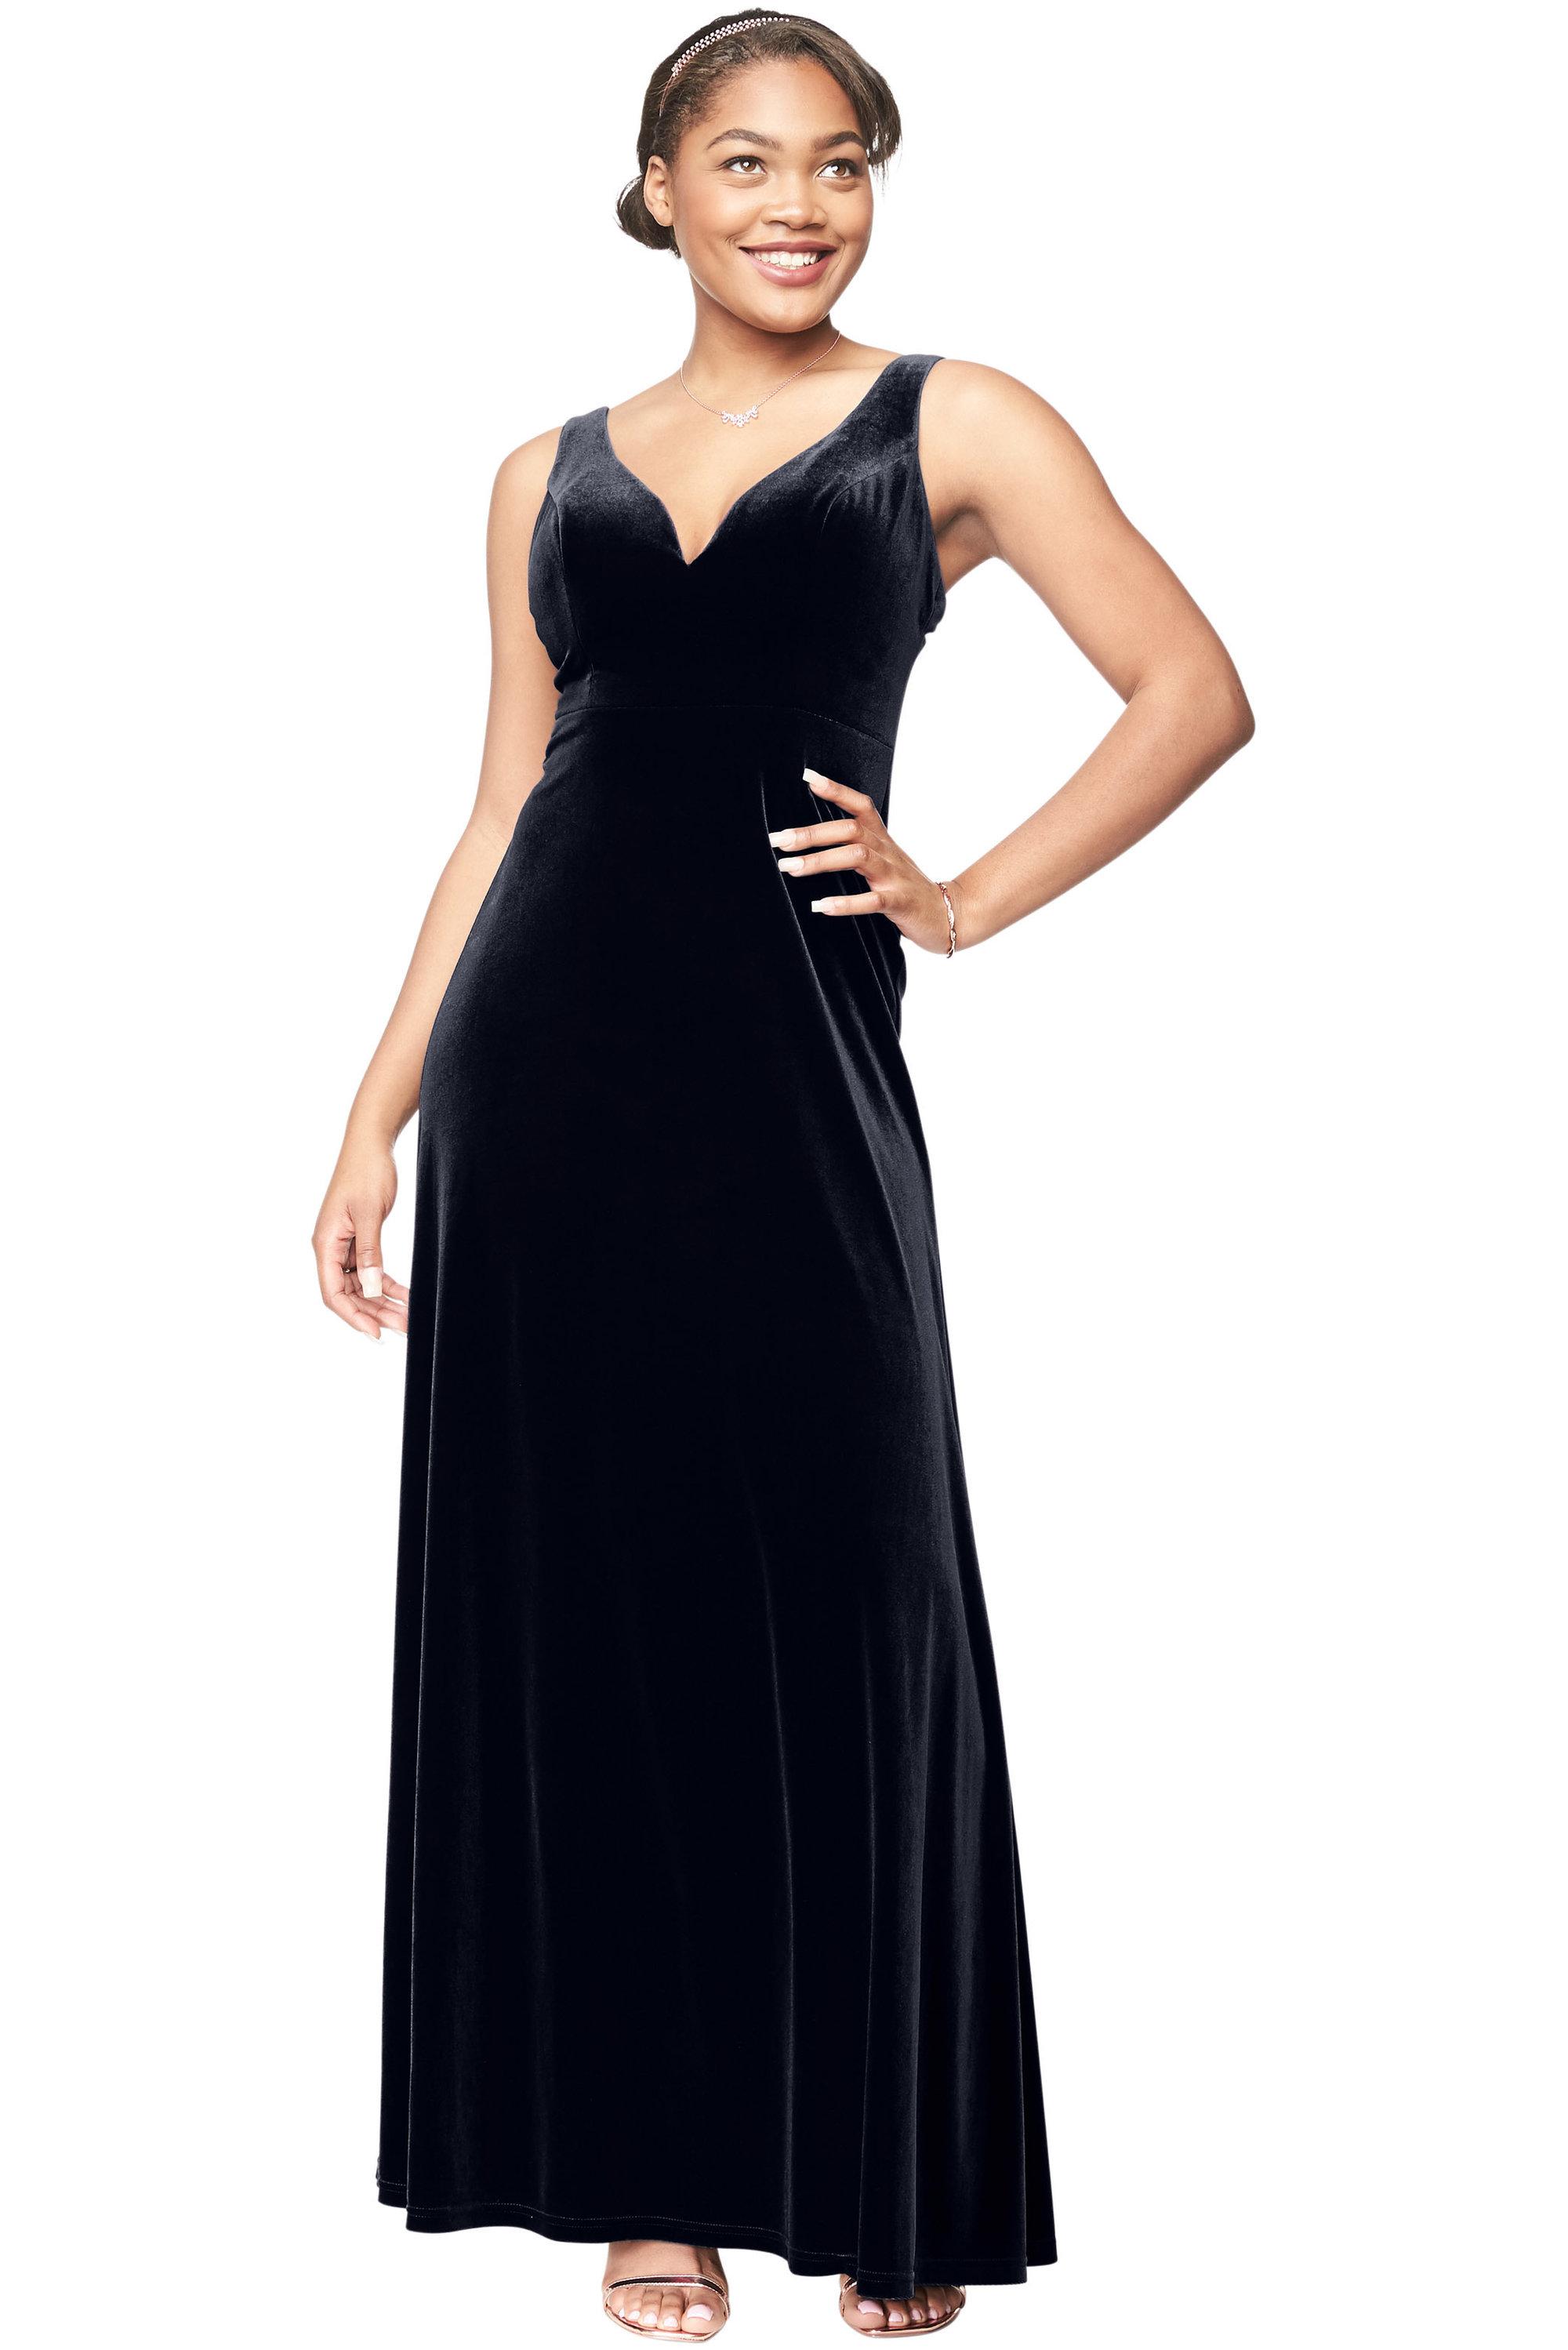 Bill Levkoff MIDNIGHT Stretch Velvet V-Neck A-Line gown, $195.50 Front